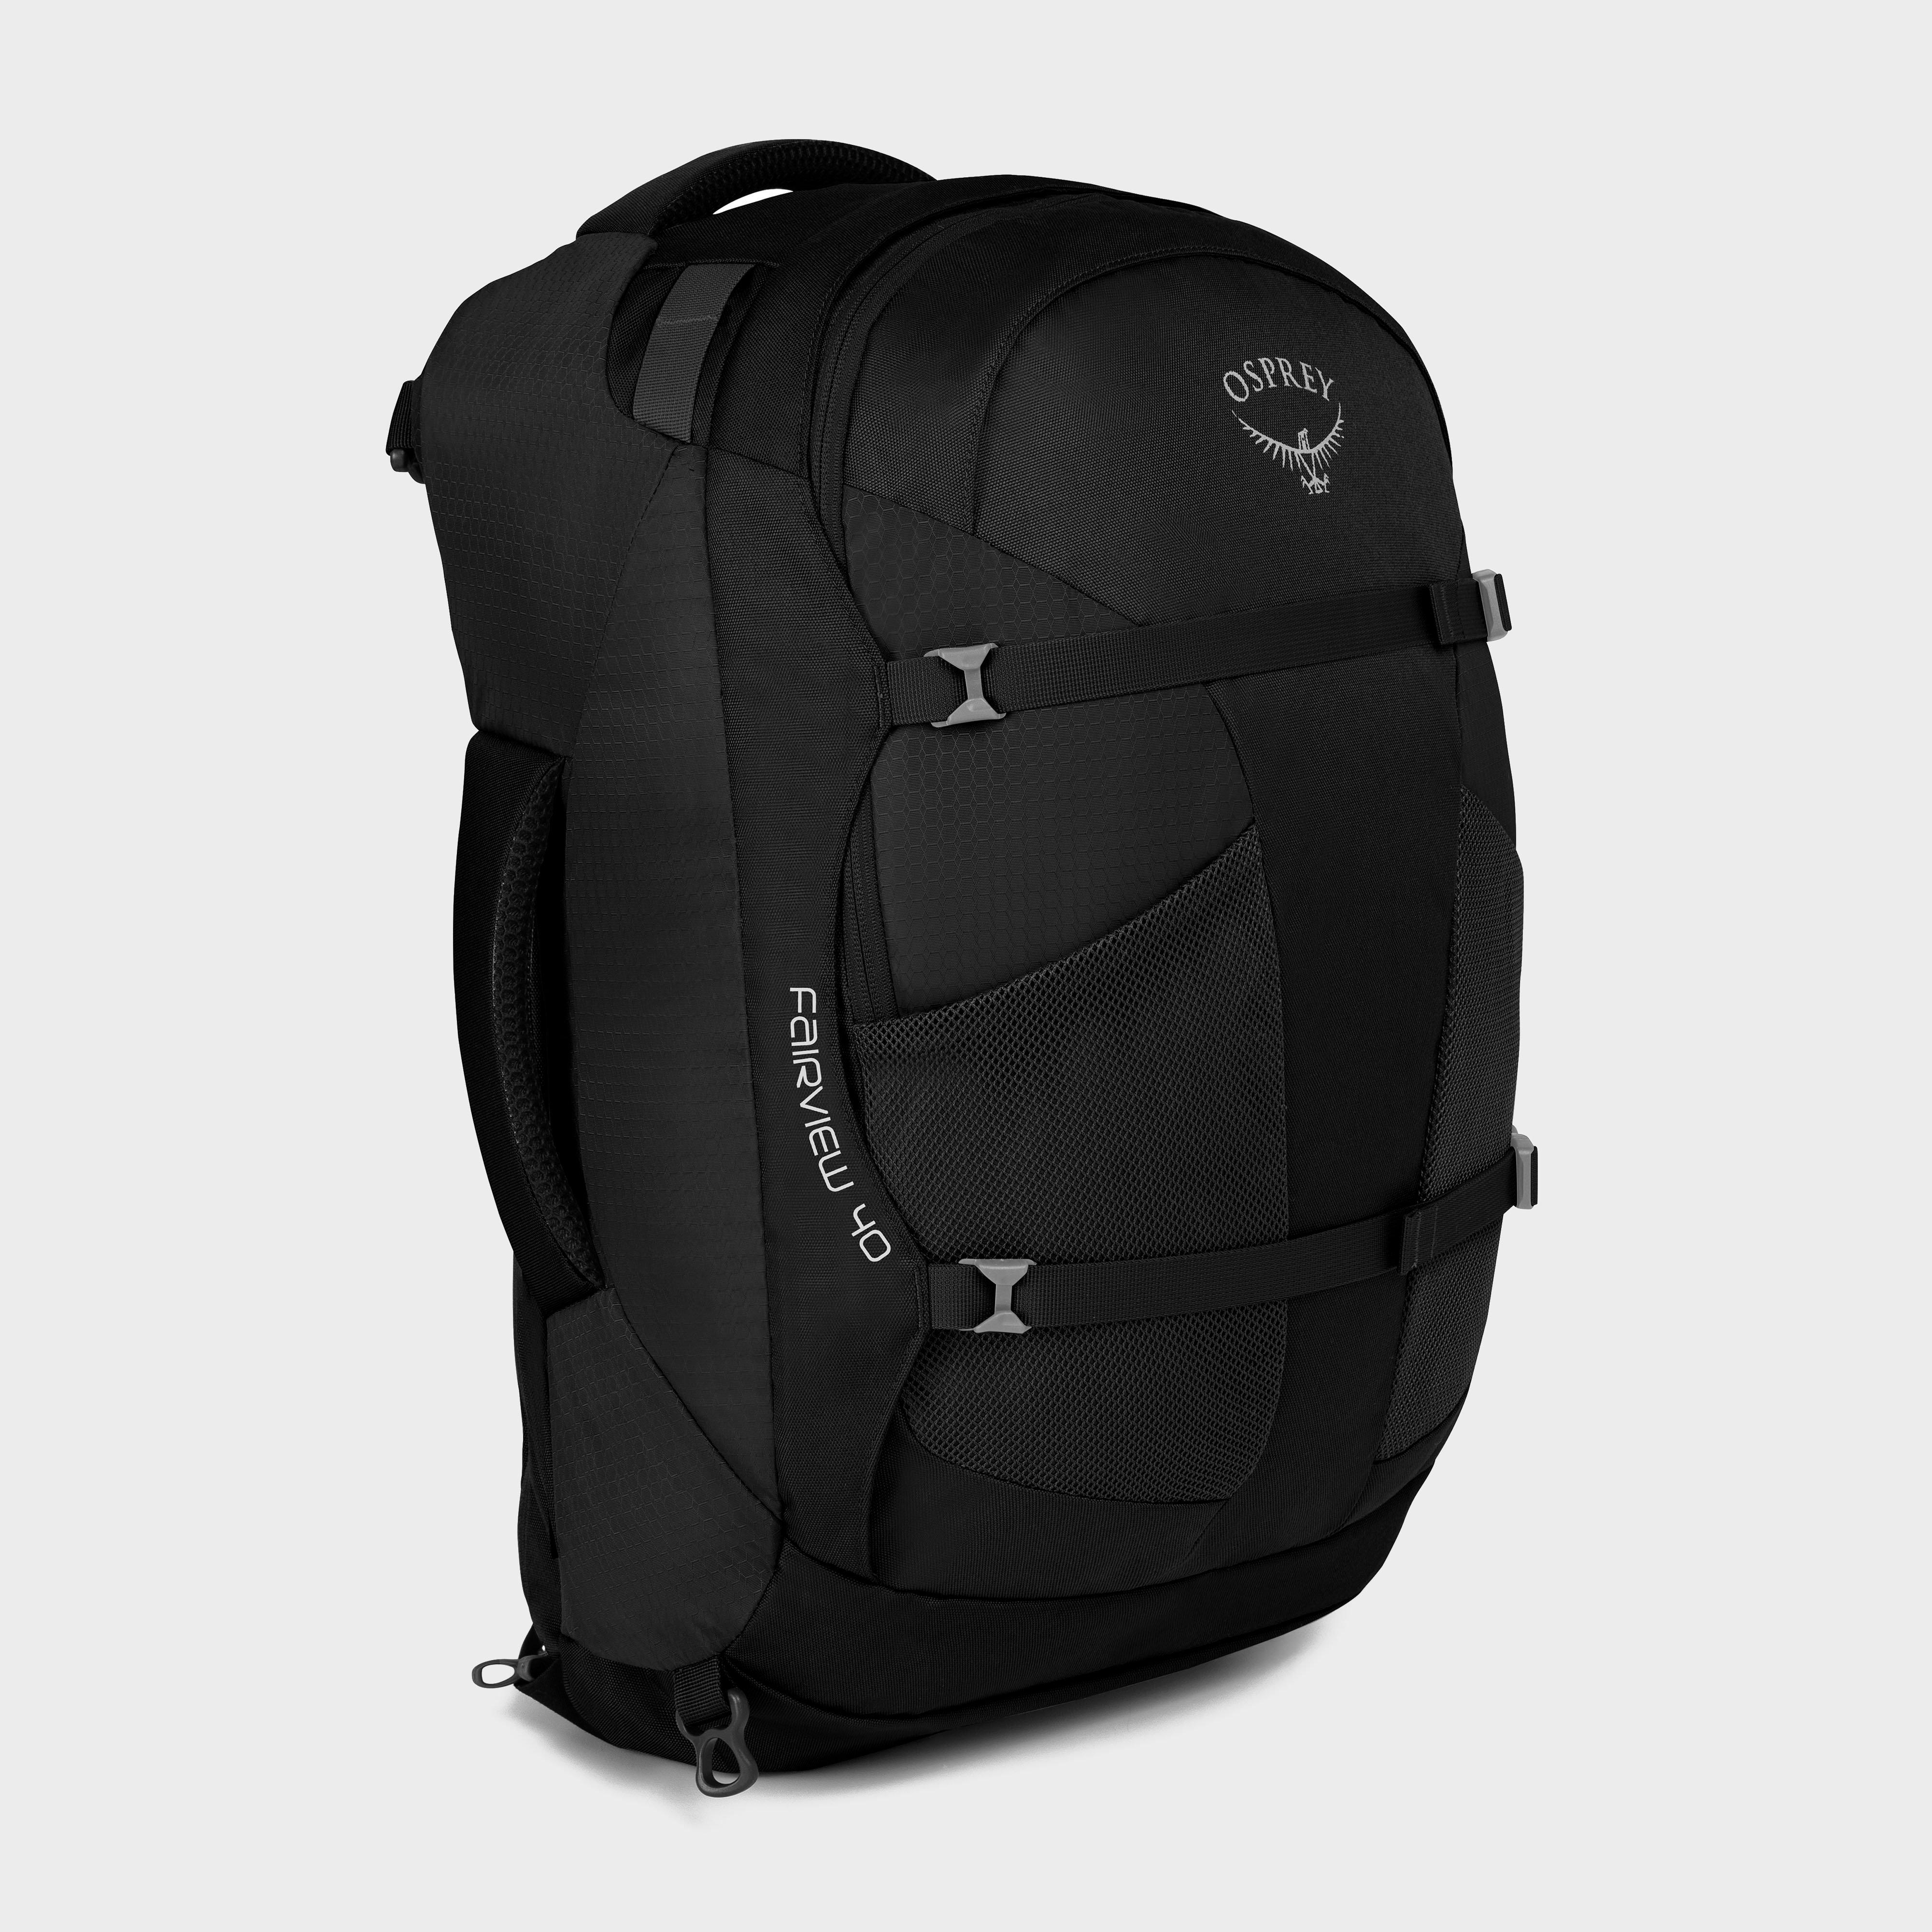 Osprey Fairview 40 - Black/Blk, Black